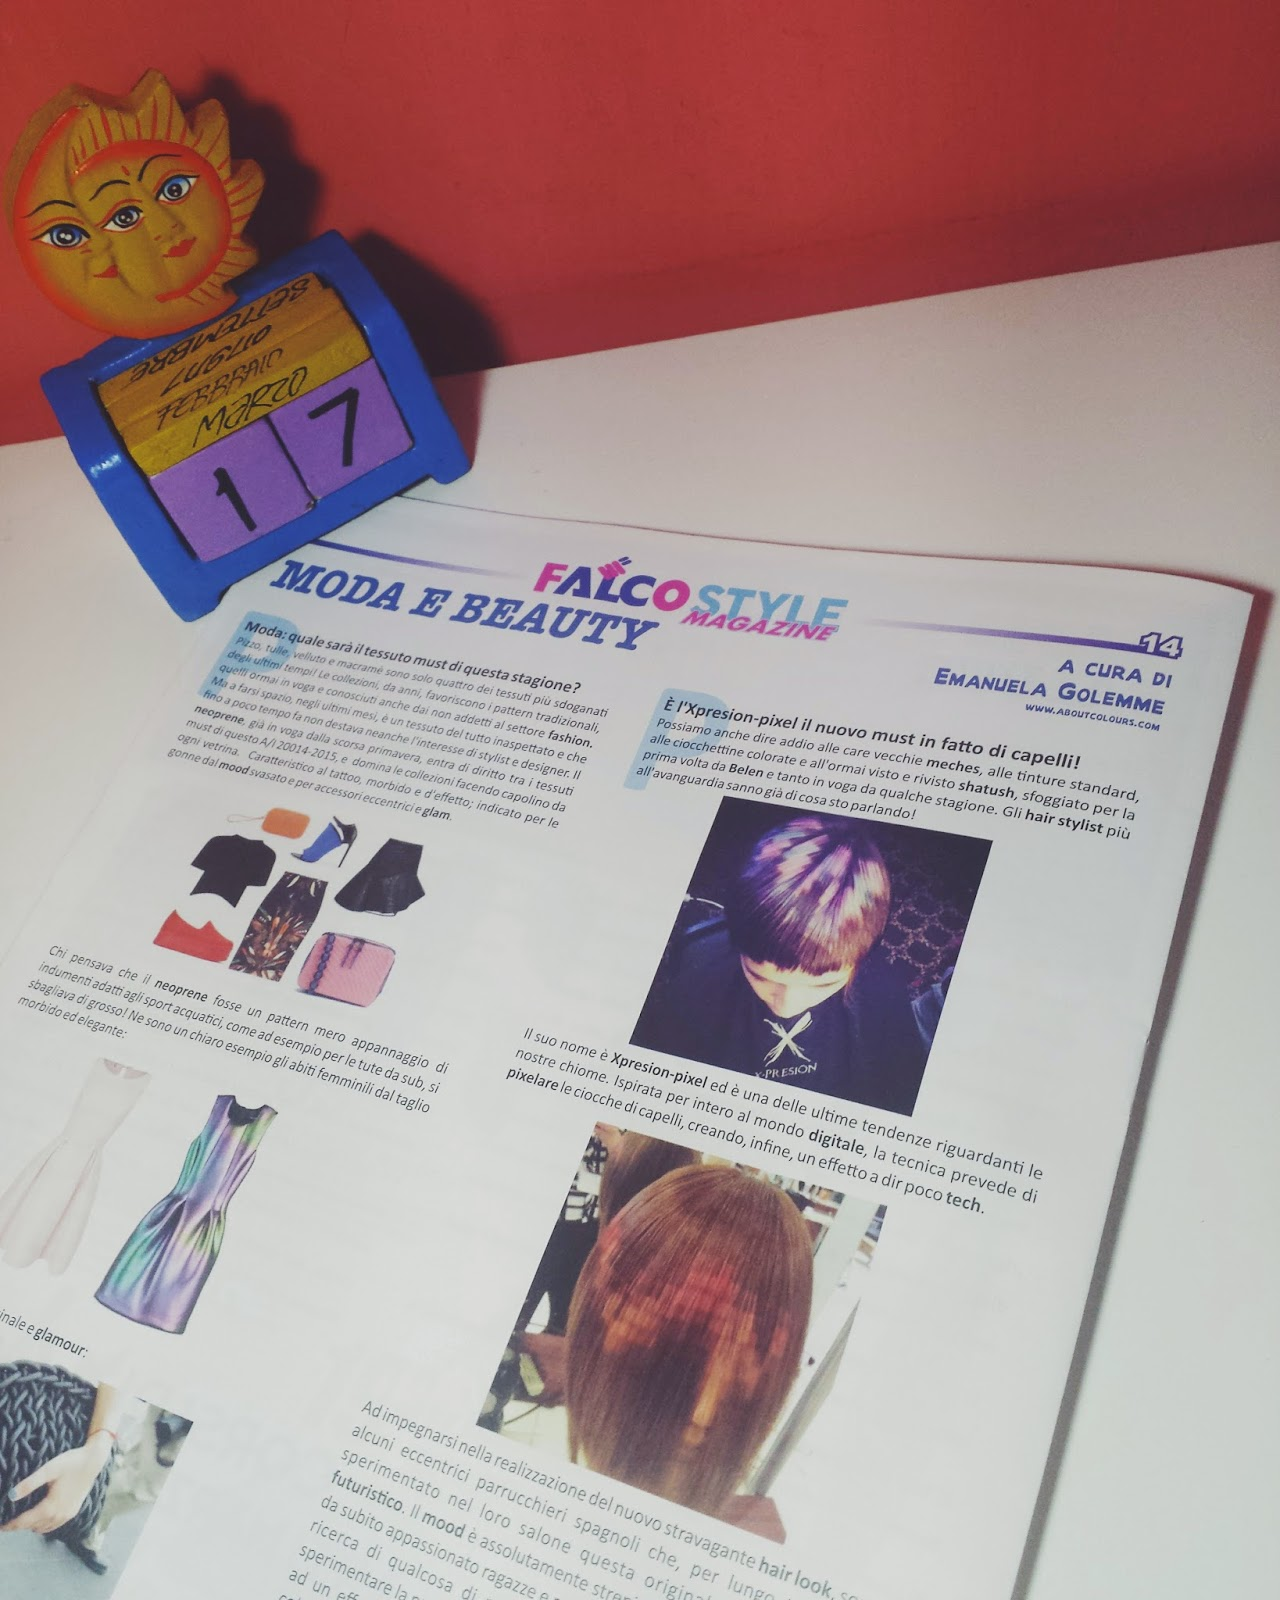 magazine, free press, moda, falco style magazine